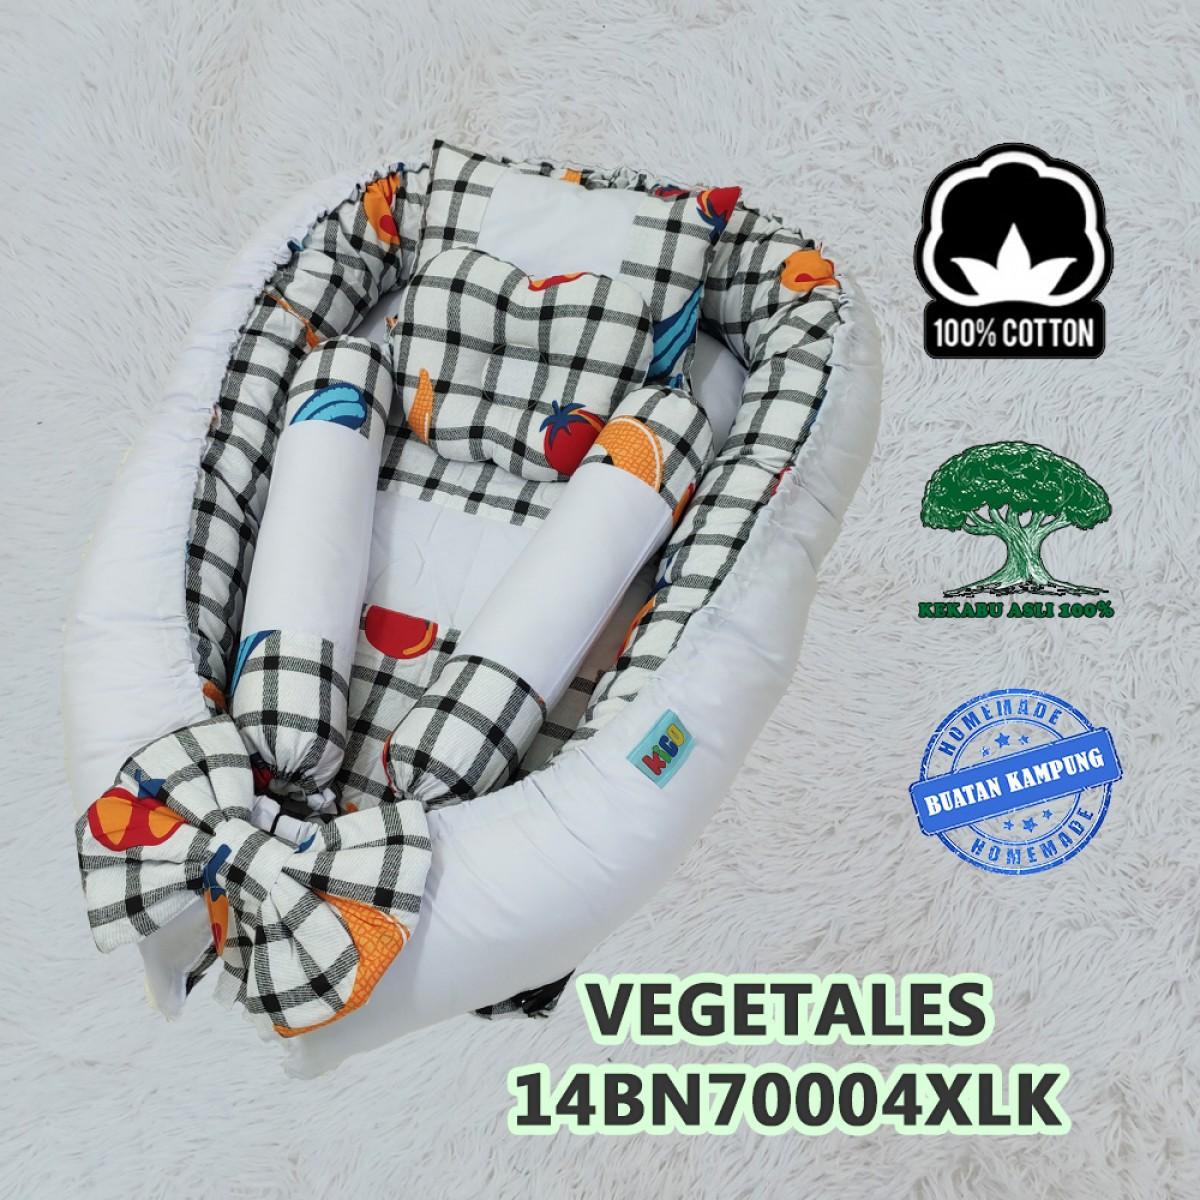 Vegetales - Kico Baby Center